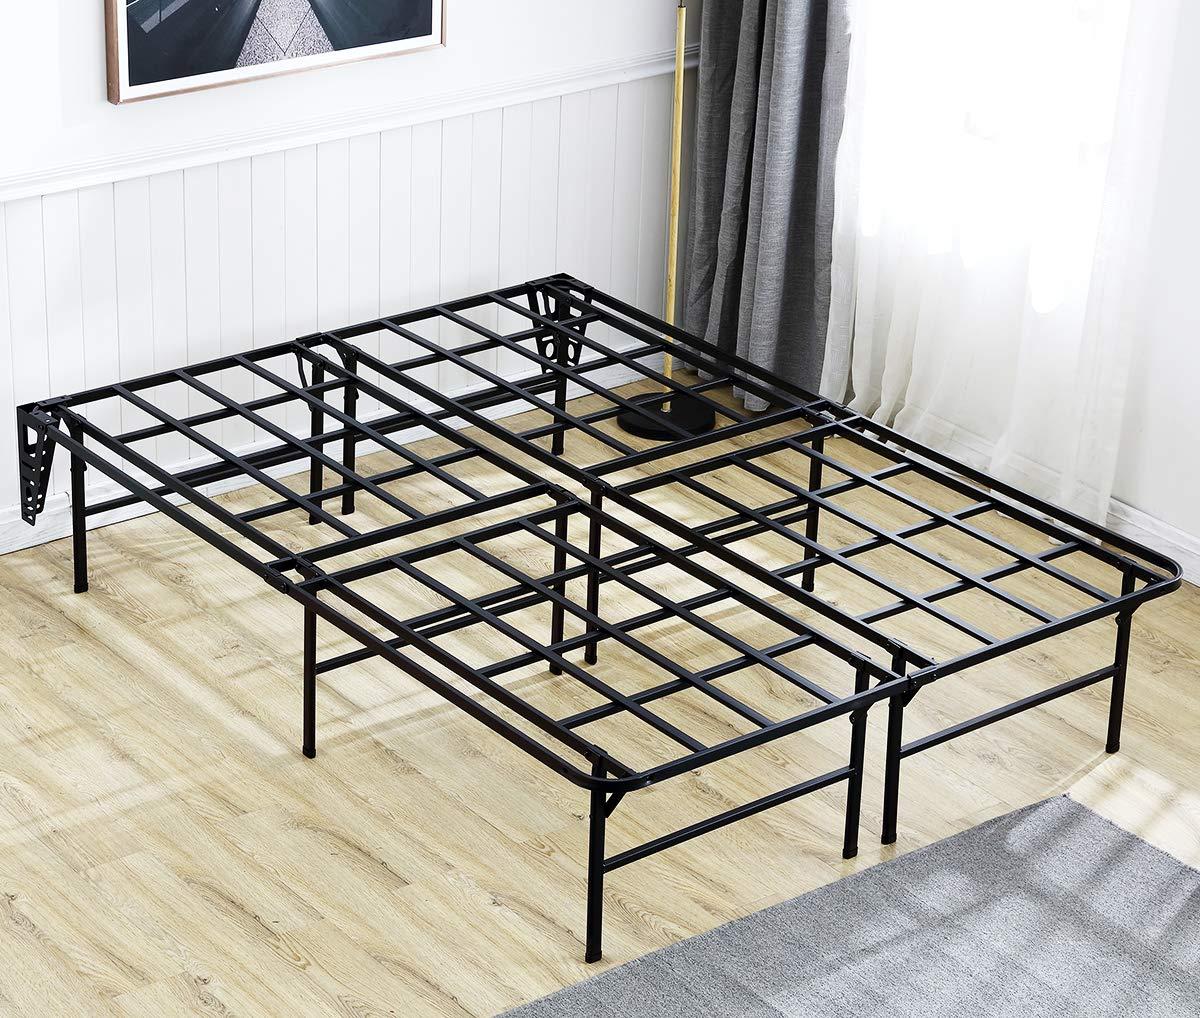 AmazonBasics Foldable Metal Platform Bed Frame for Under-Bed Storage – Tools-free Assembley, No Box Spring Needed – King Renewed